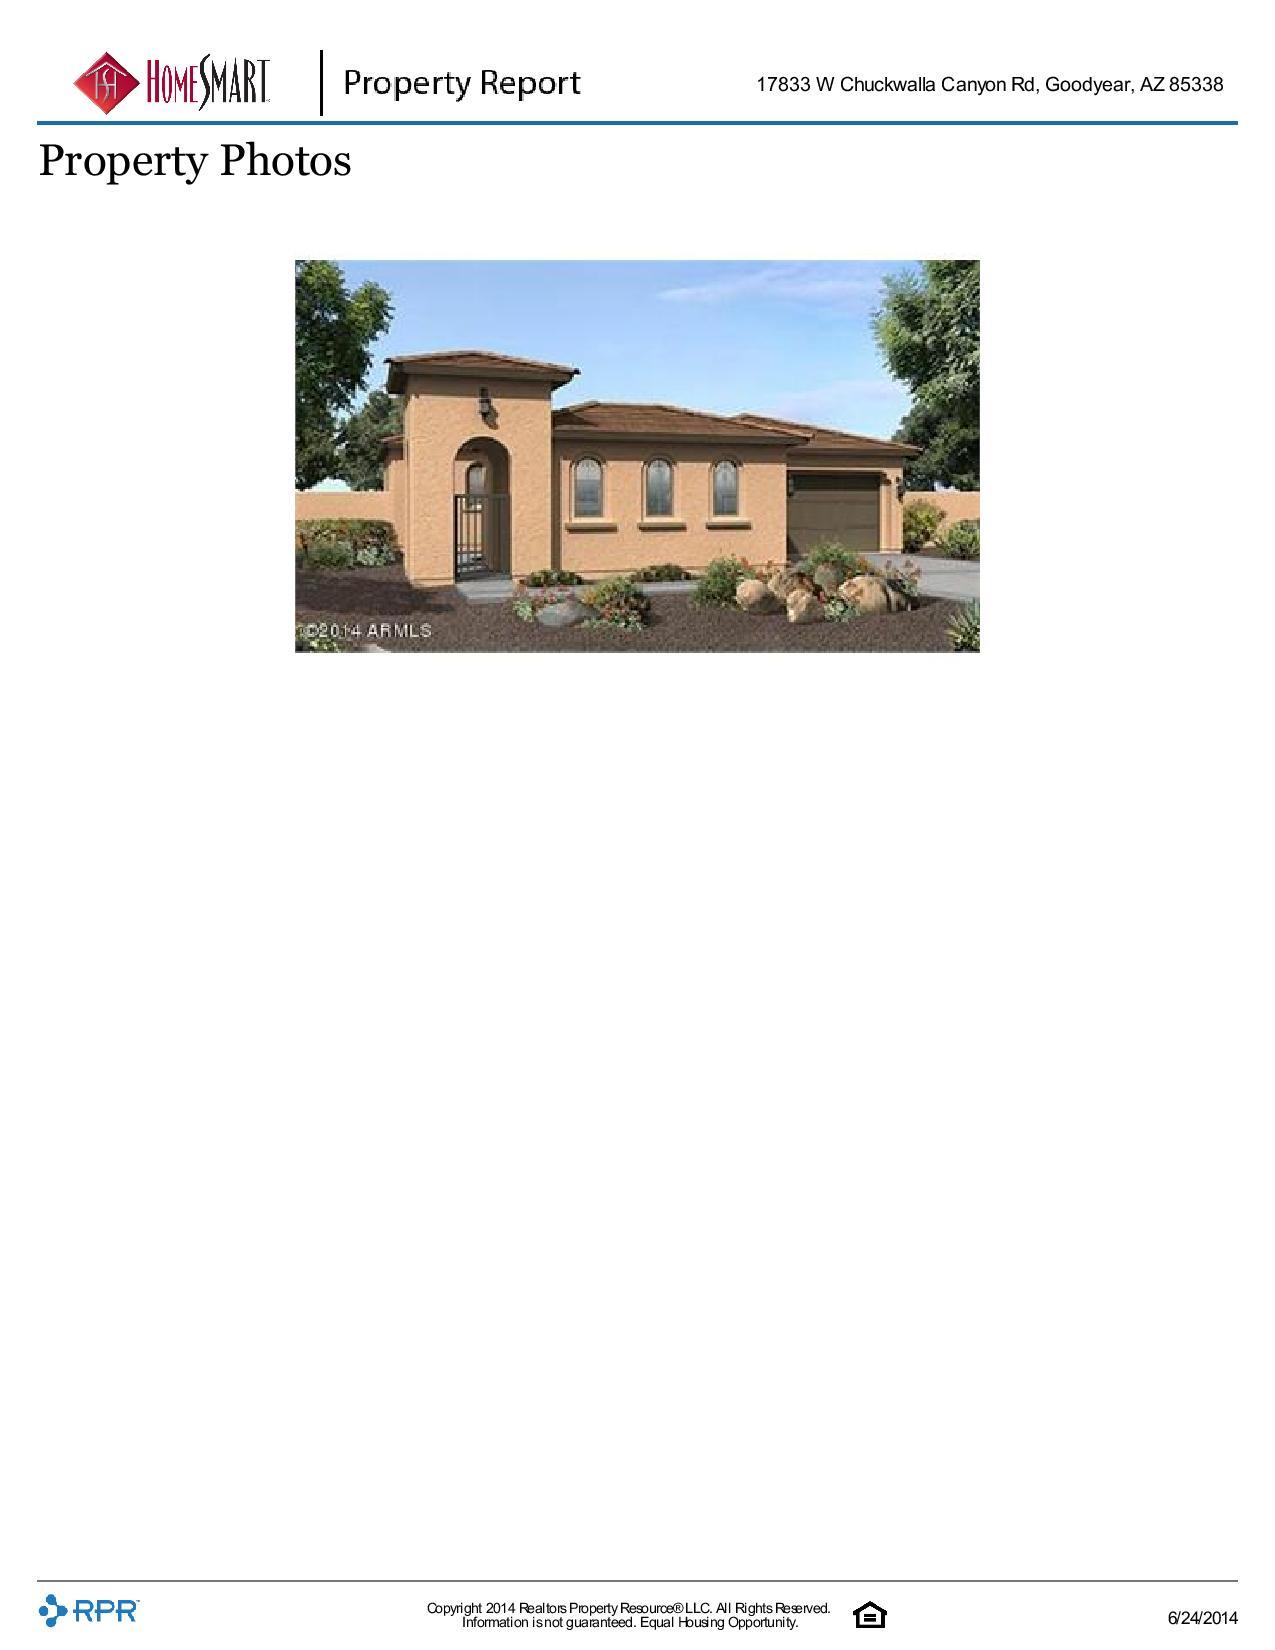 17833-W-Chuckwalla-Canyon-Rd-Goodyear-AZ-85338-page-005